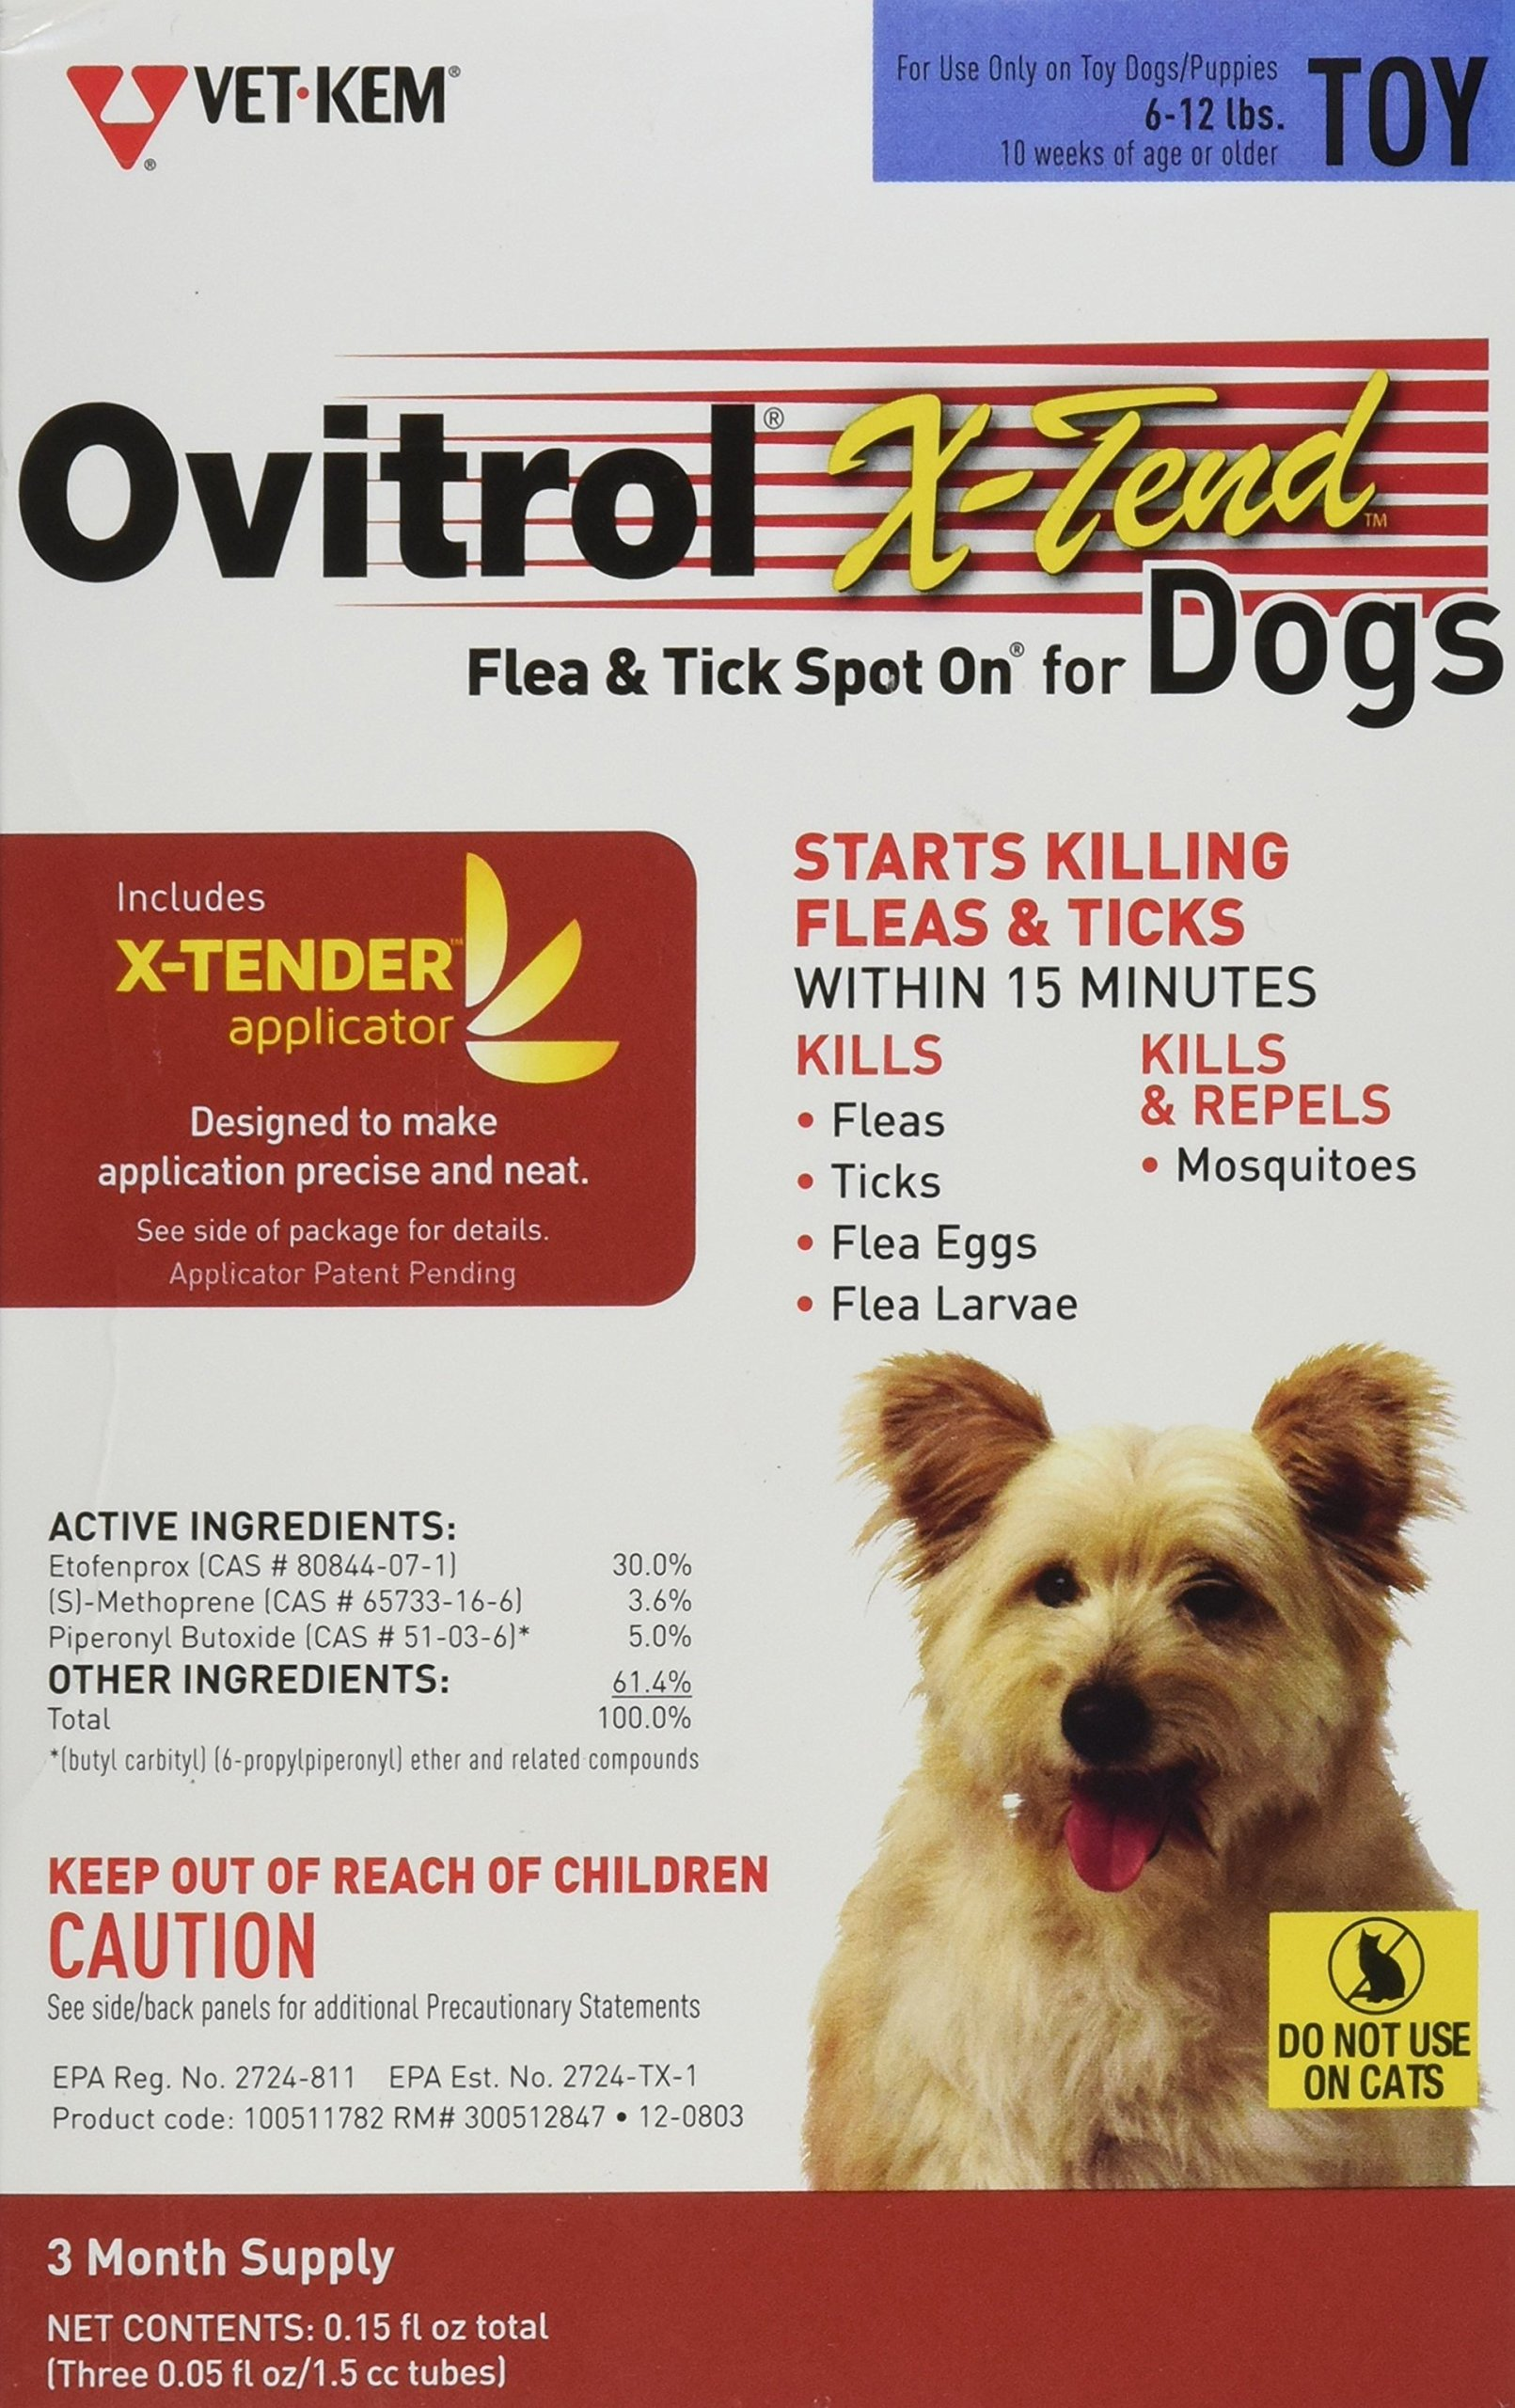 Ovitrol Vet-Kem 3-Pack X-Tend Pest Control Spot on for Dog Toy, 6 to 12-Pound